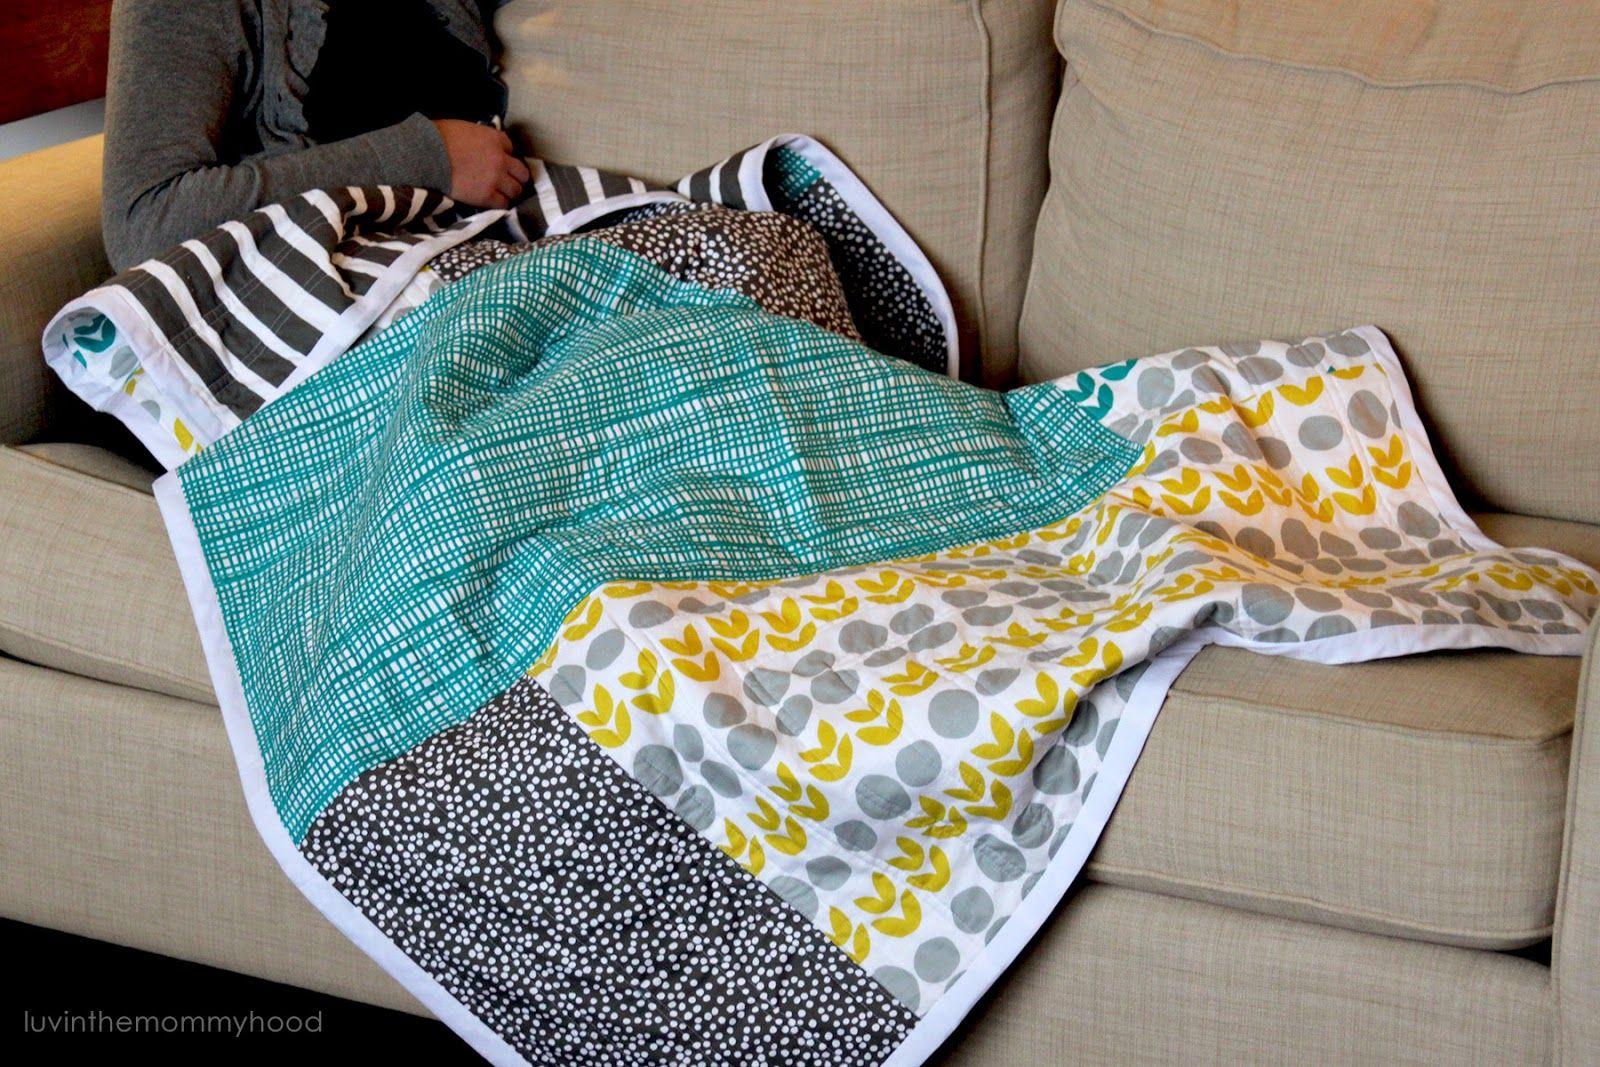 luvinthemommyhood: Bella Collage Quilt Tutorial; Lotta Jansdotter fabric